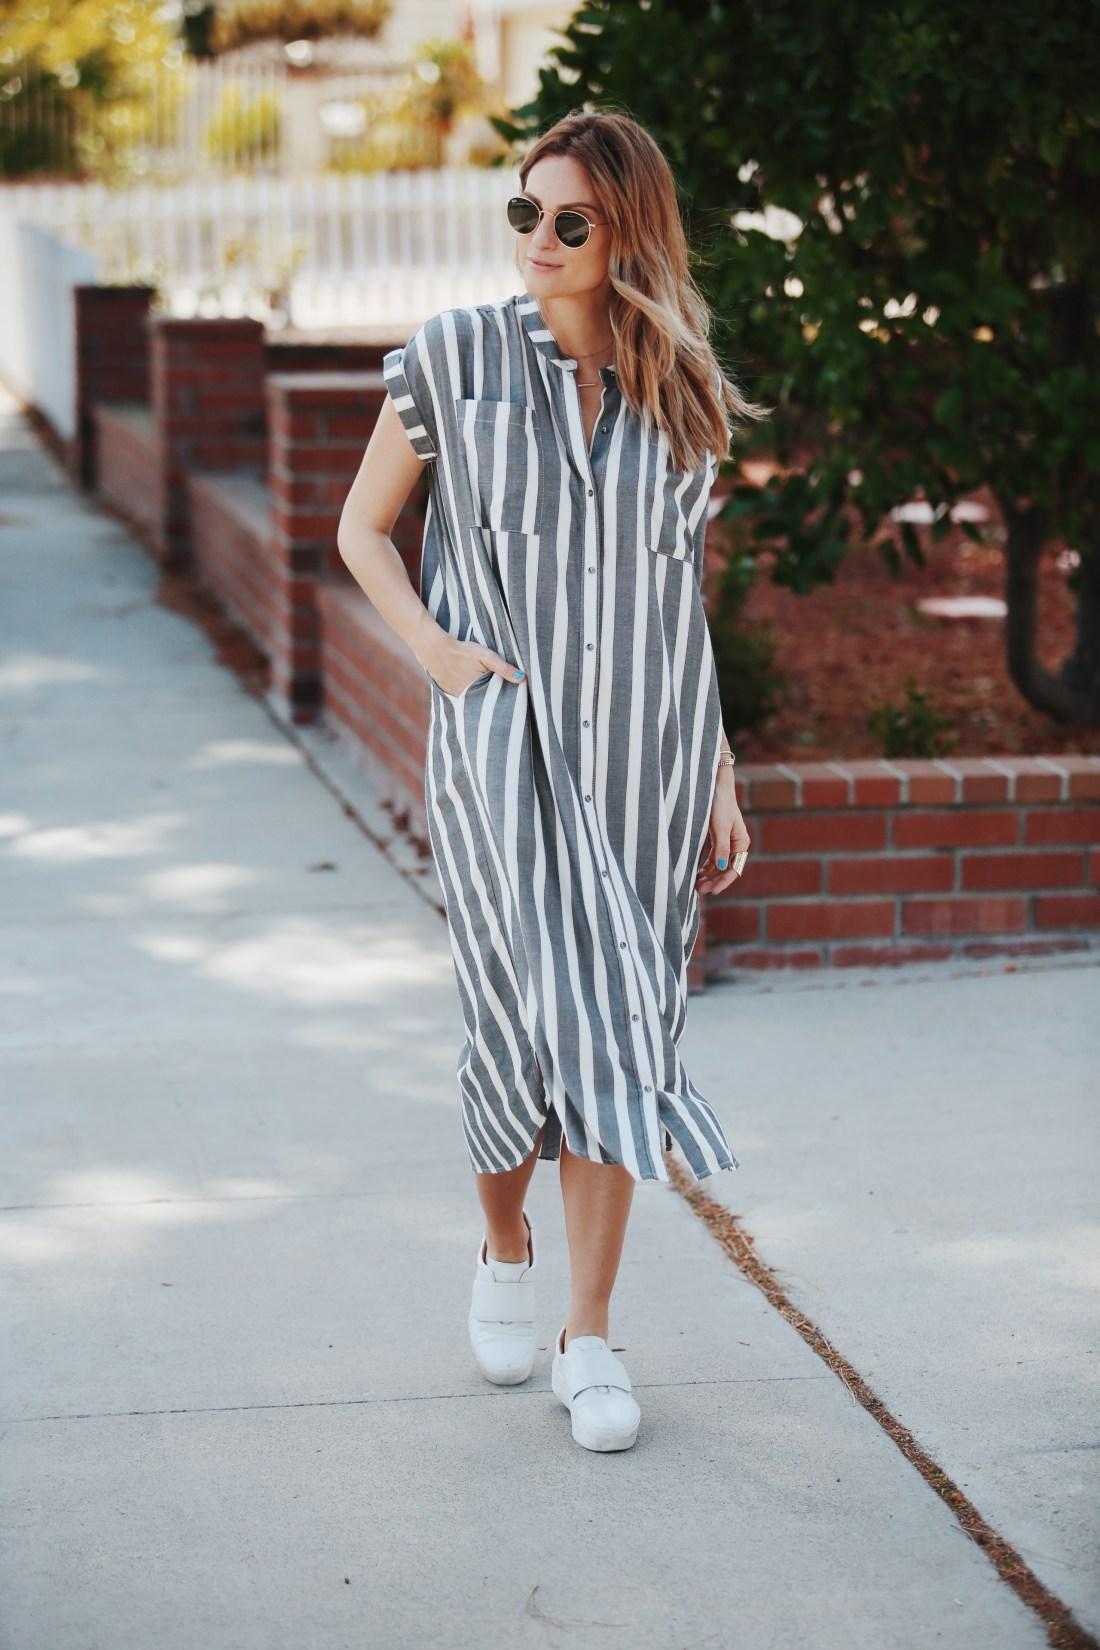 Shirt Dresses Under $100 | Knot Sisters Haze Shirt Dress | Palms to Pines